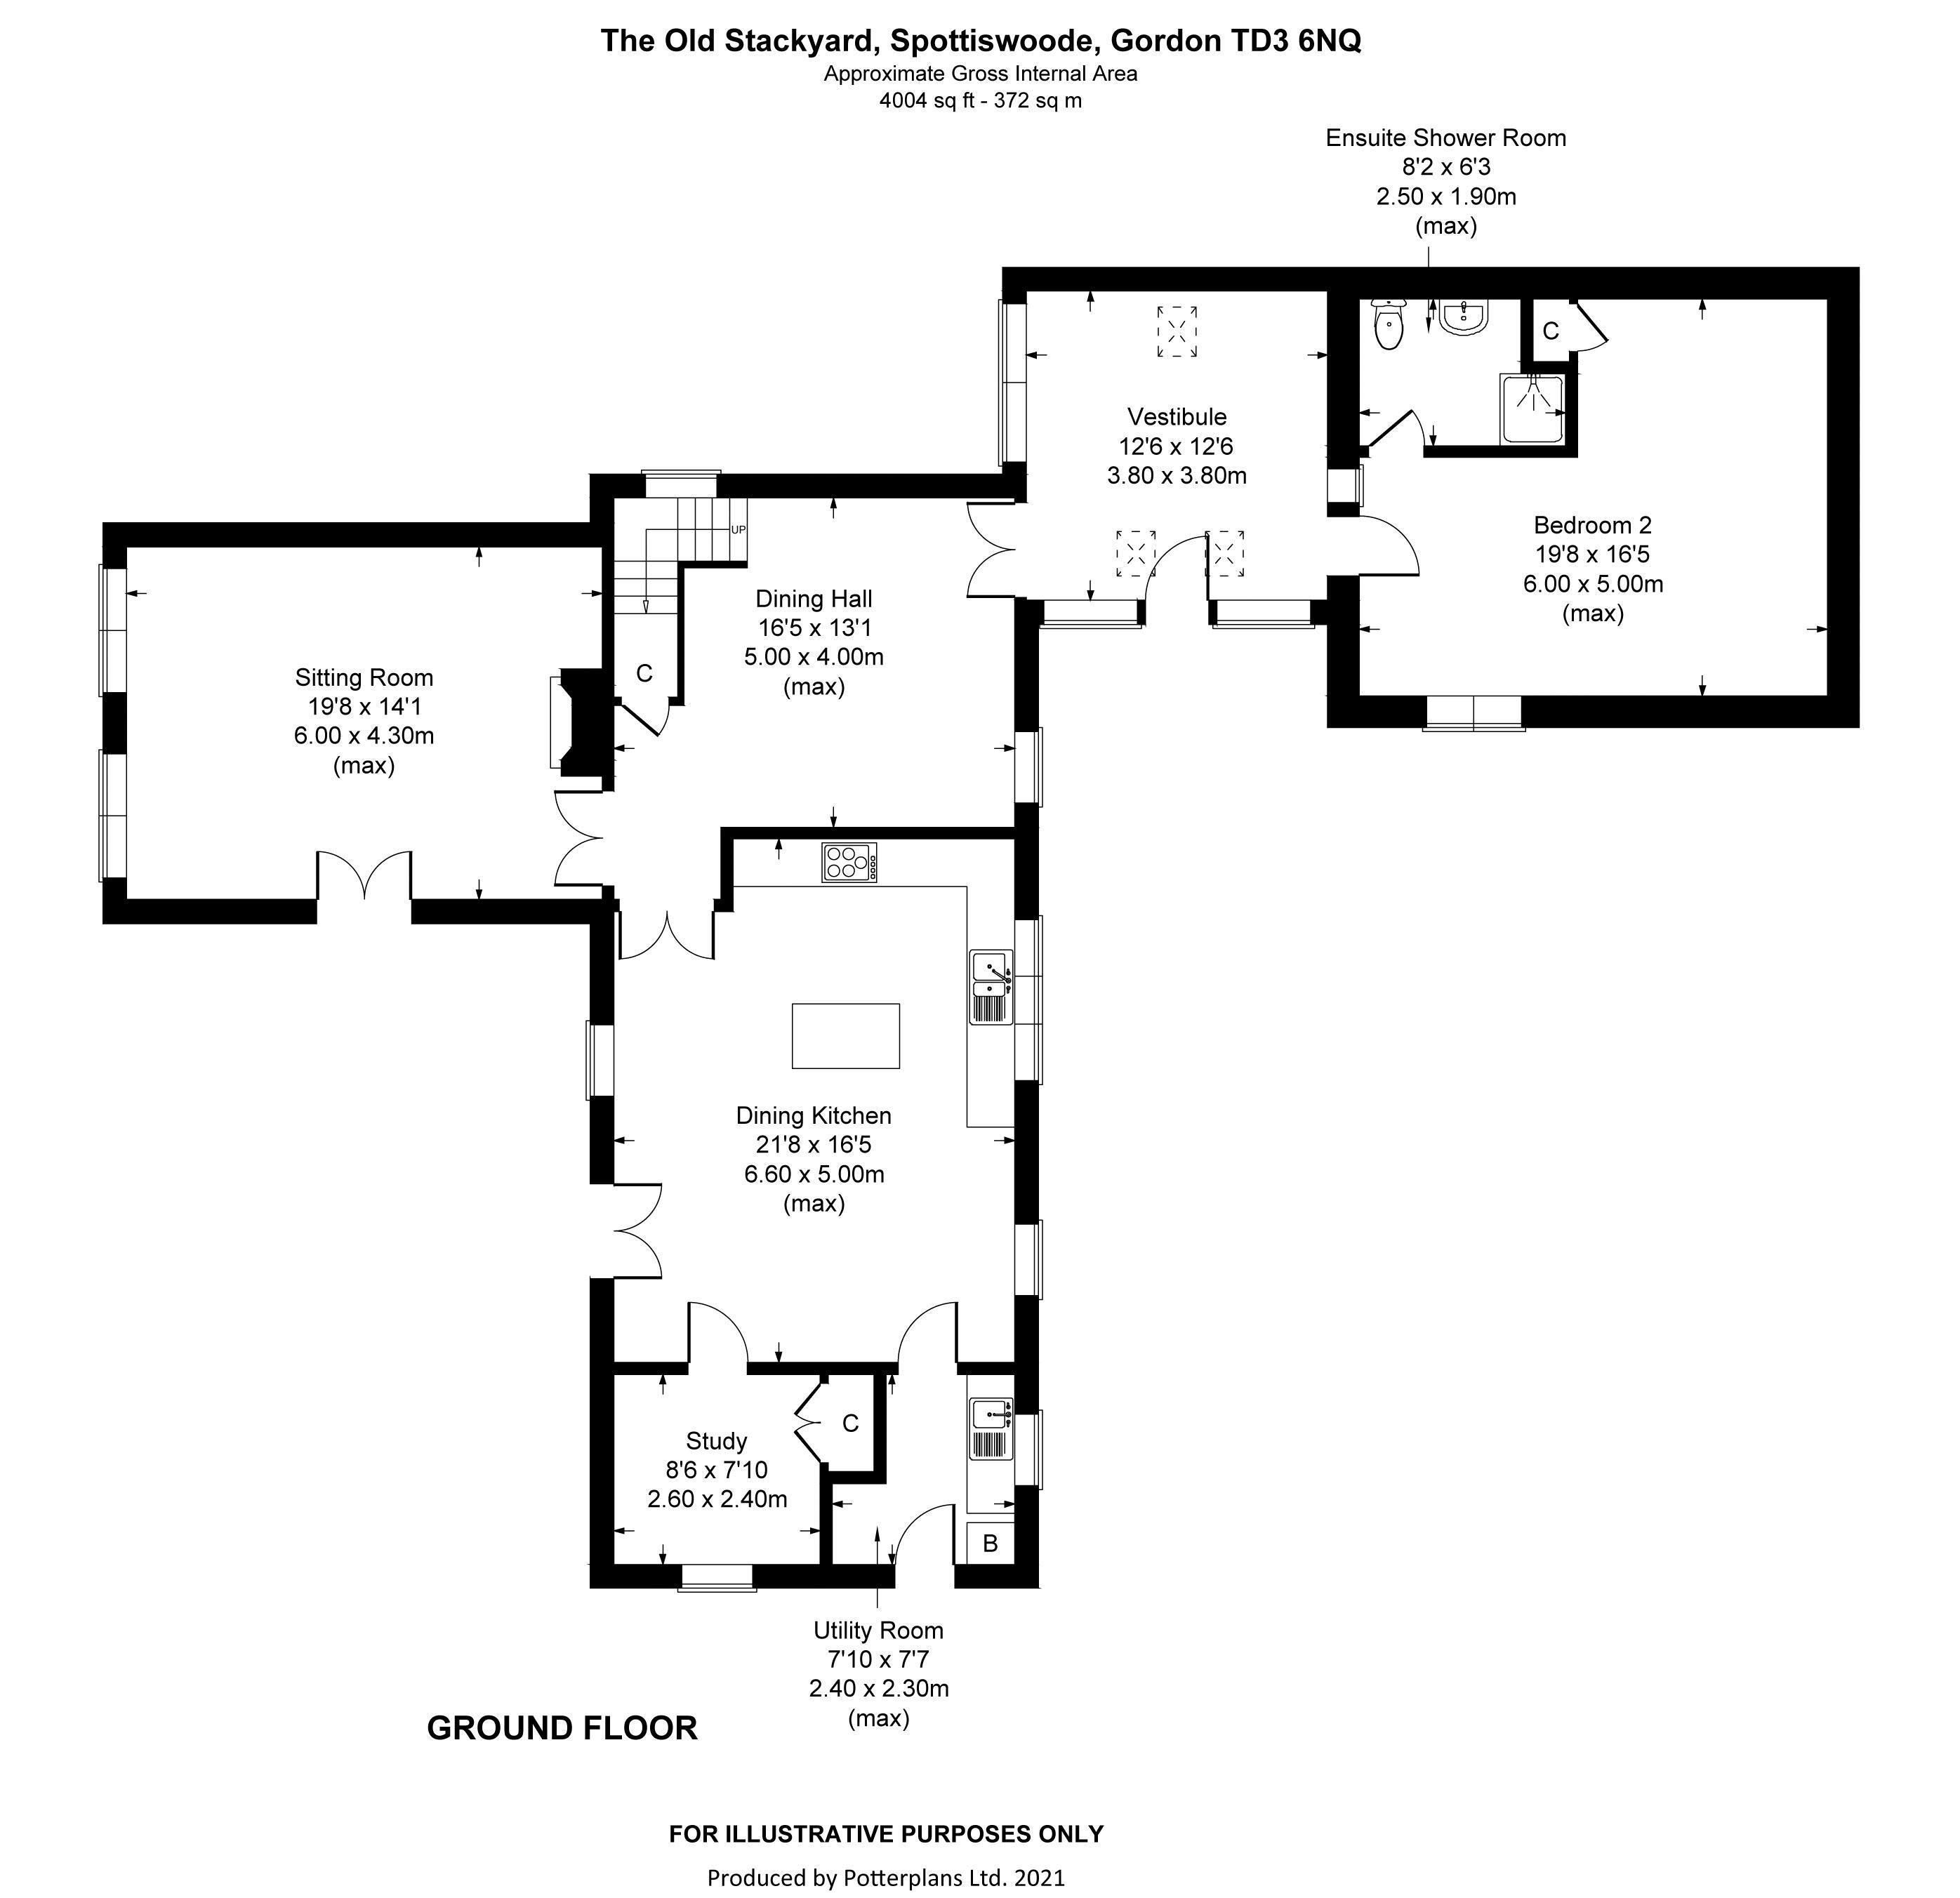 The Old Stackyard Ground Floor